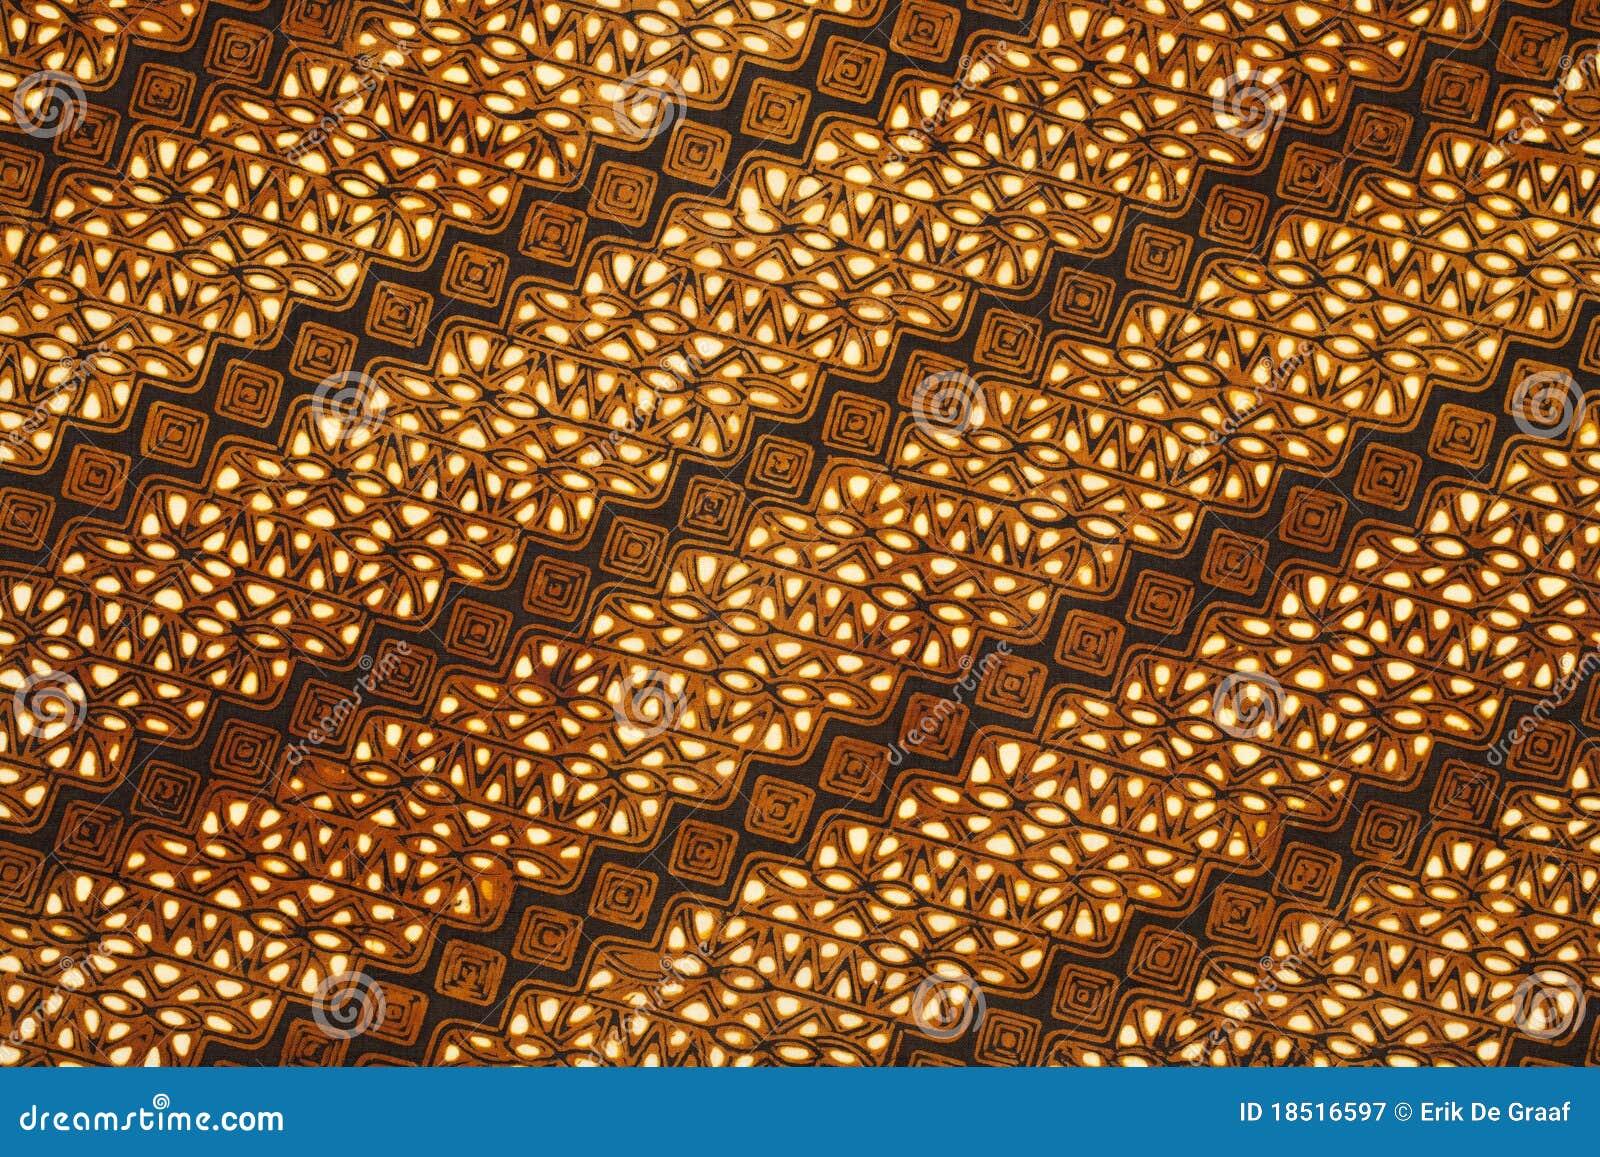 Batik design royalty free stock photos image 29546988 - Batik Design Royalty Free Stock Photography Image 18516597 Wallpaper